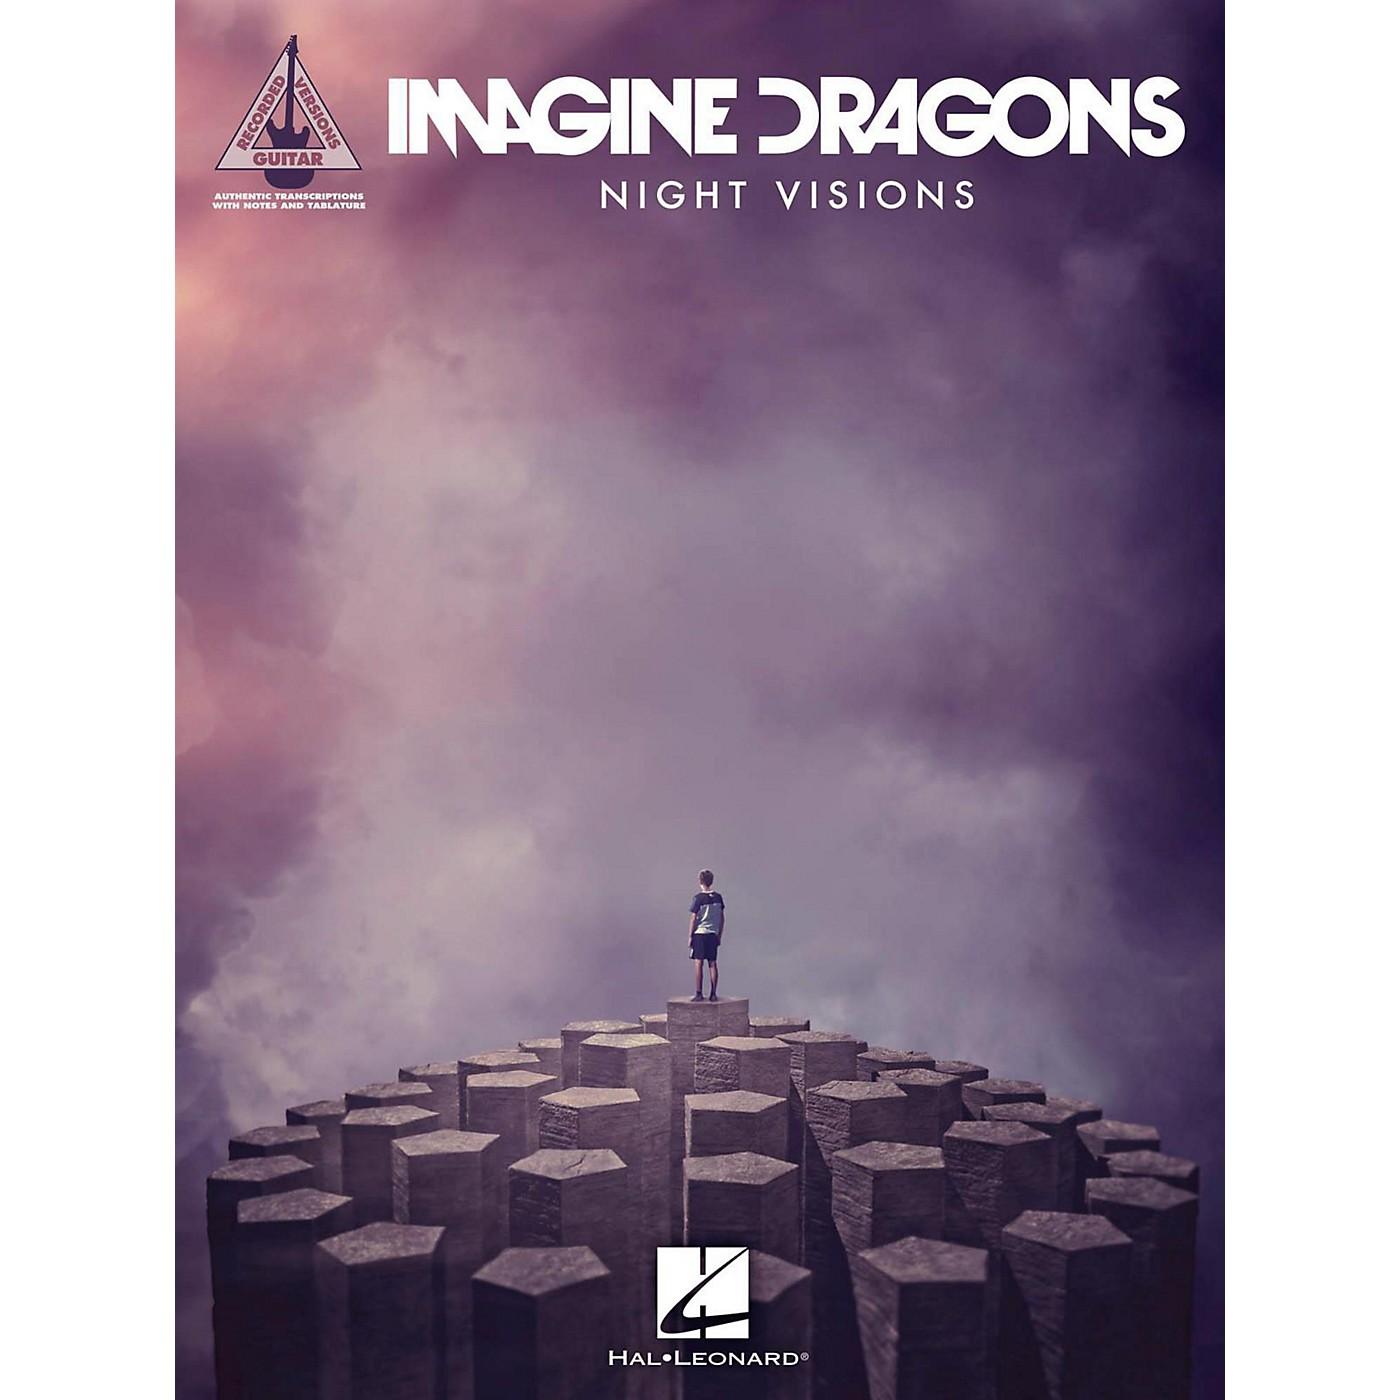 Hal Leonard Imagine Dragons - Night Visions Guitar Tab Songbook thumbnail